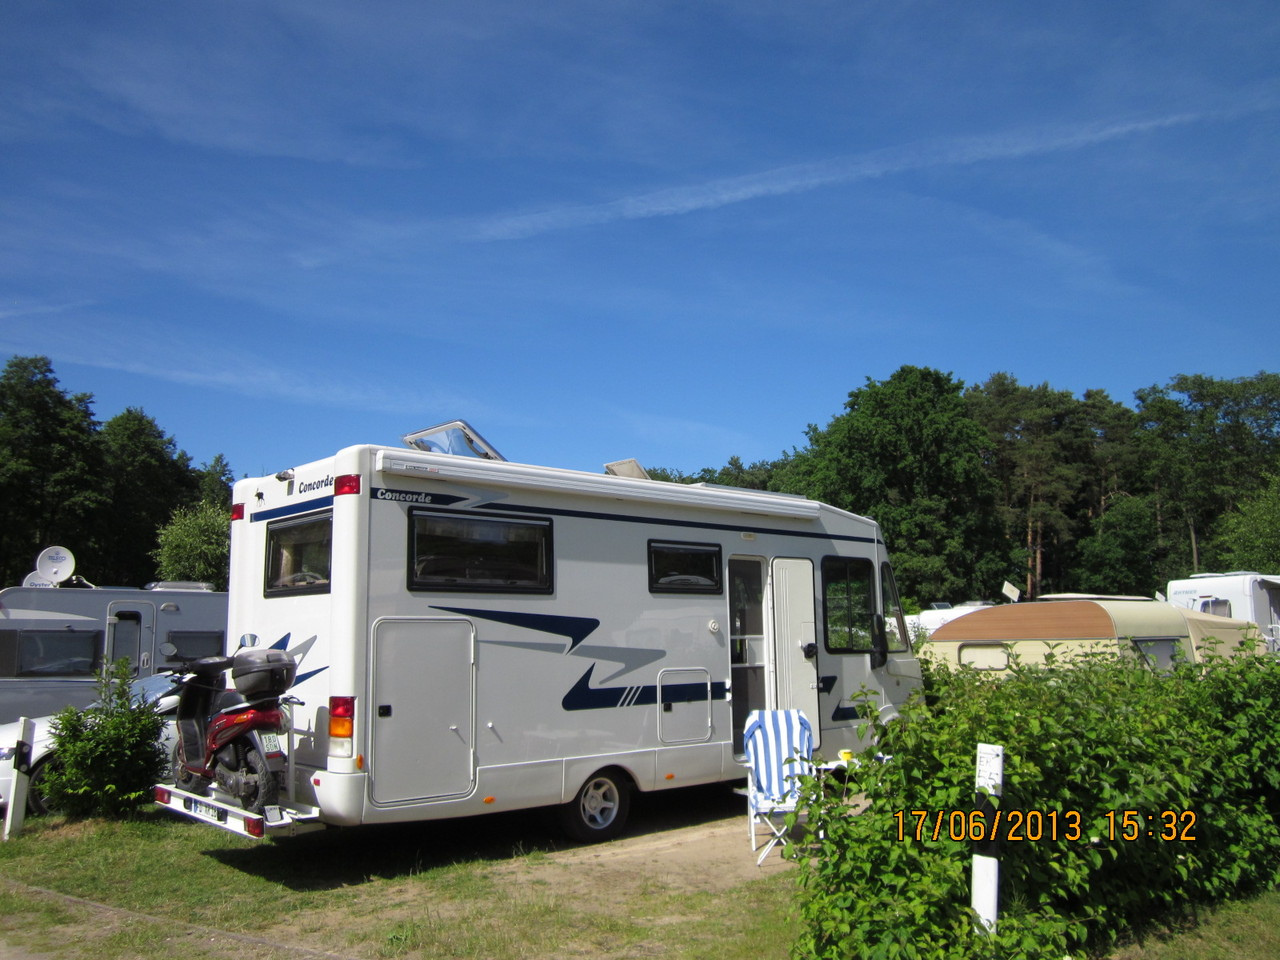 Campingplatz Ückeritz